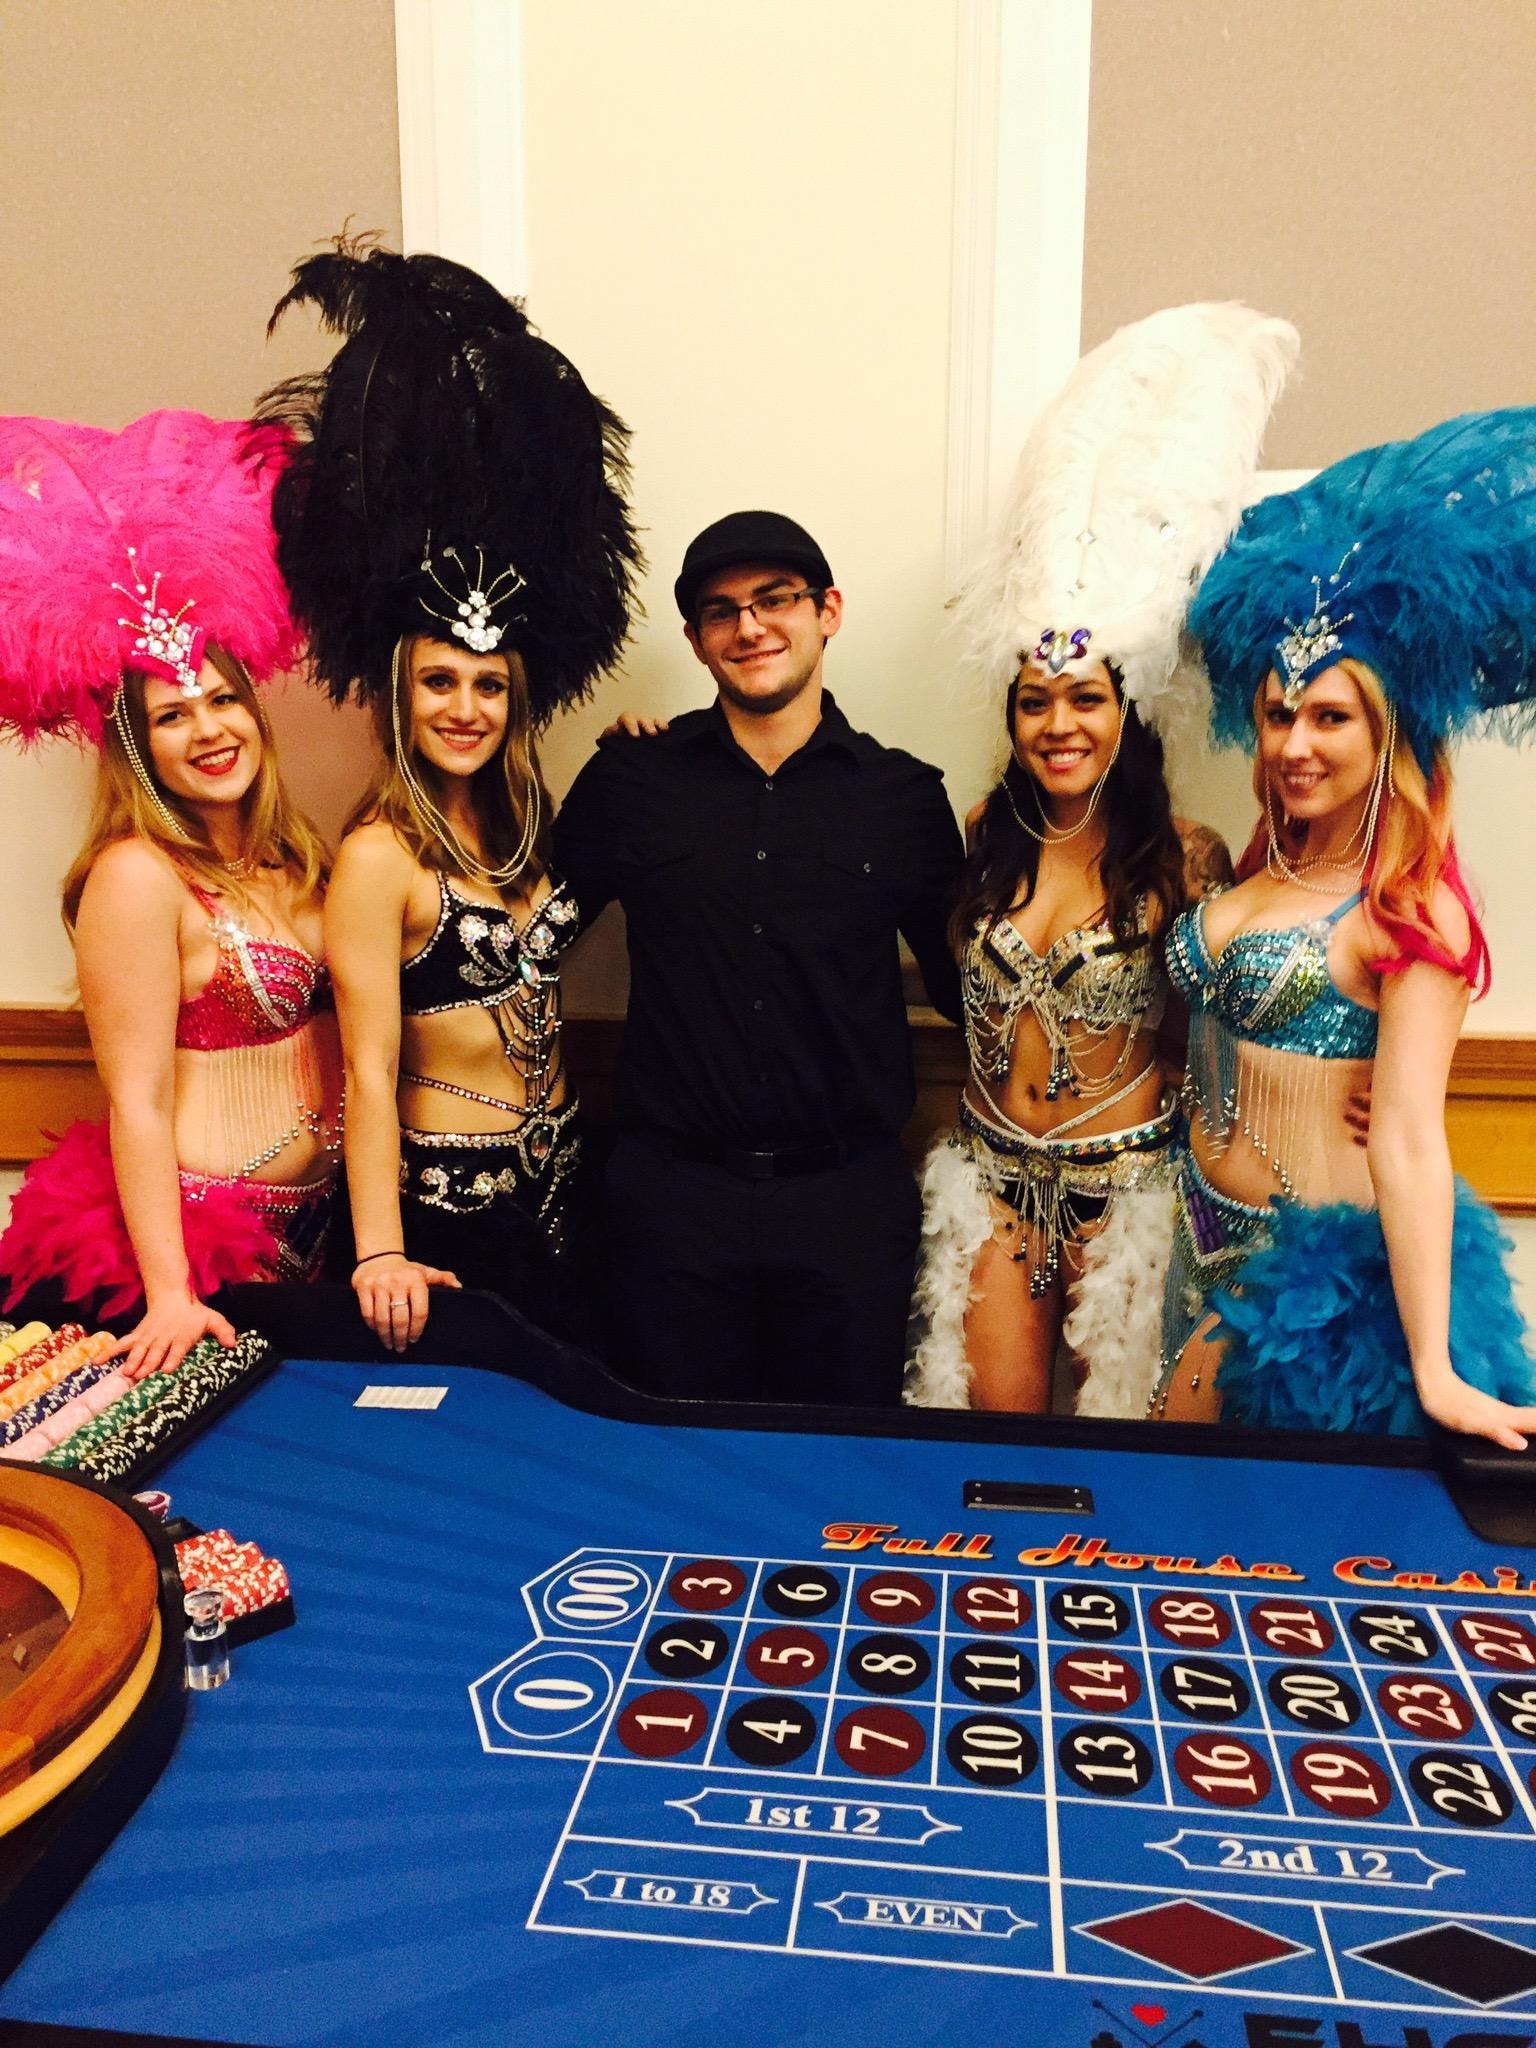 Casino rental in los angeles santa ana casino employment